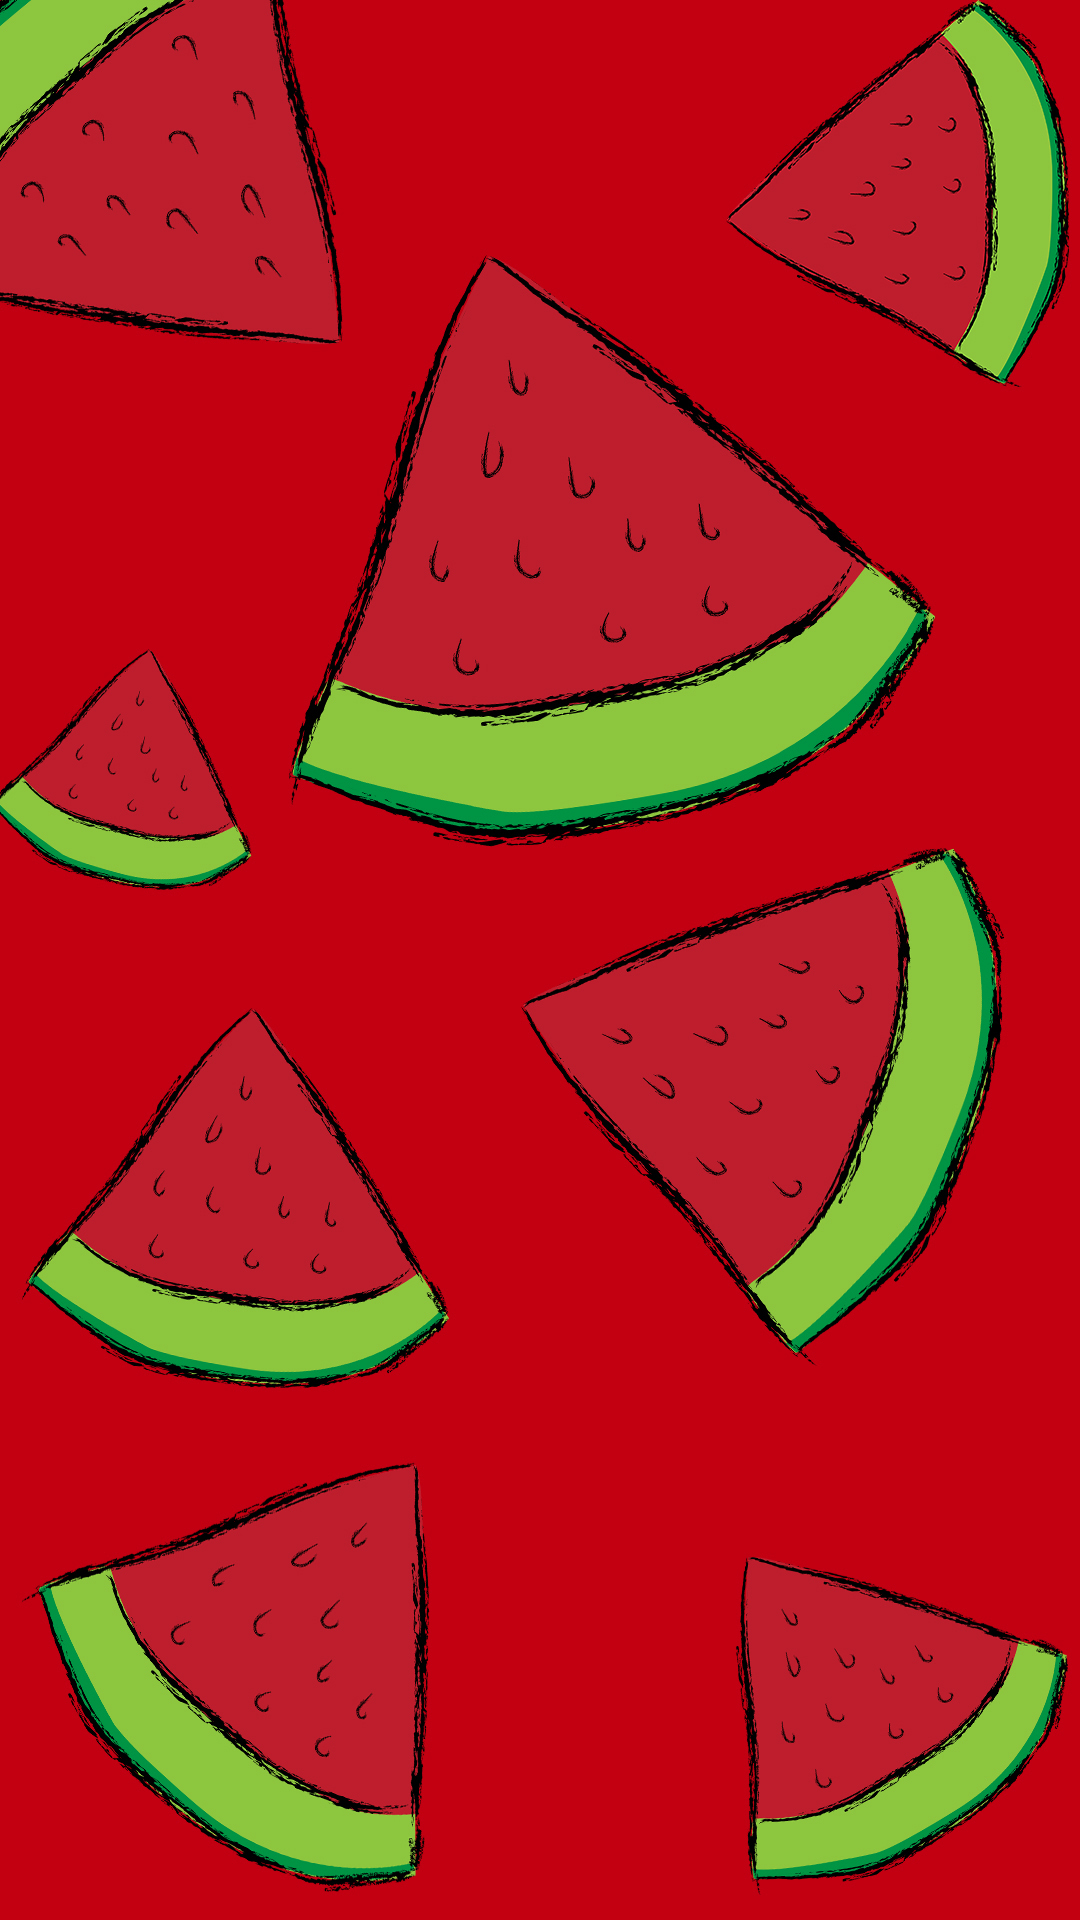 watermelon-1223